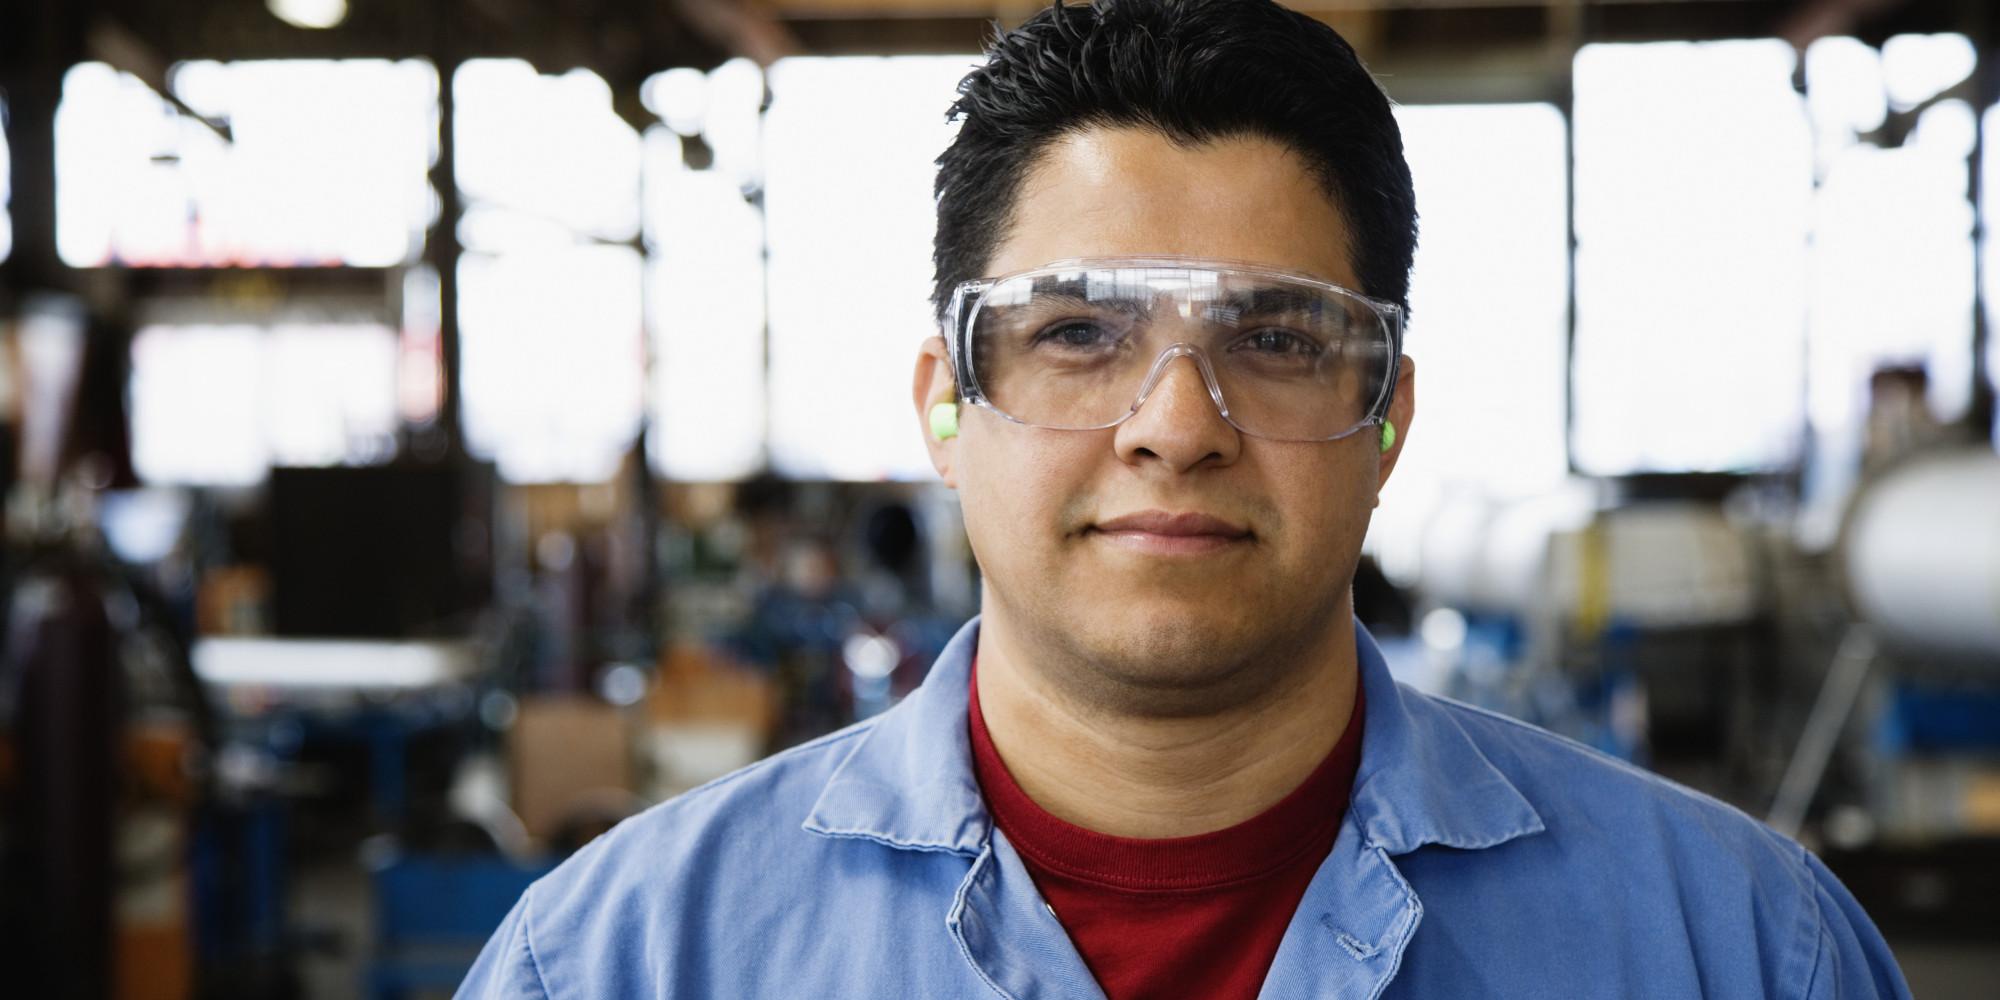 Hispanic_Minimum_Wage_Jobs.jpg